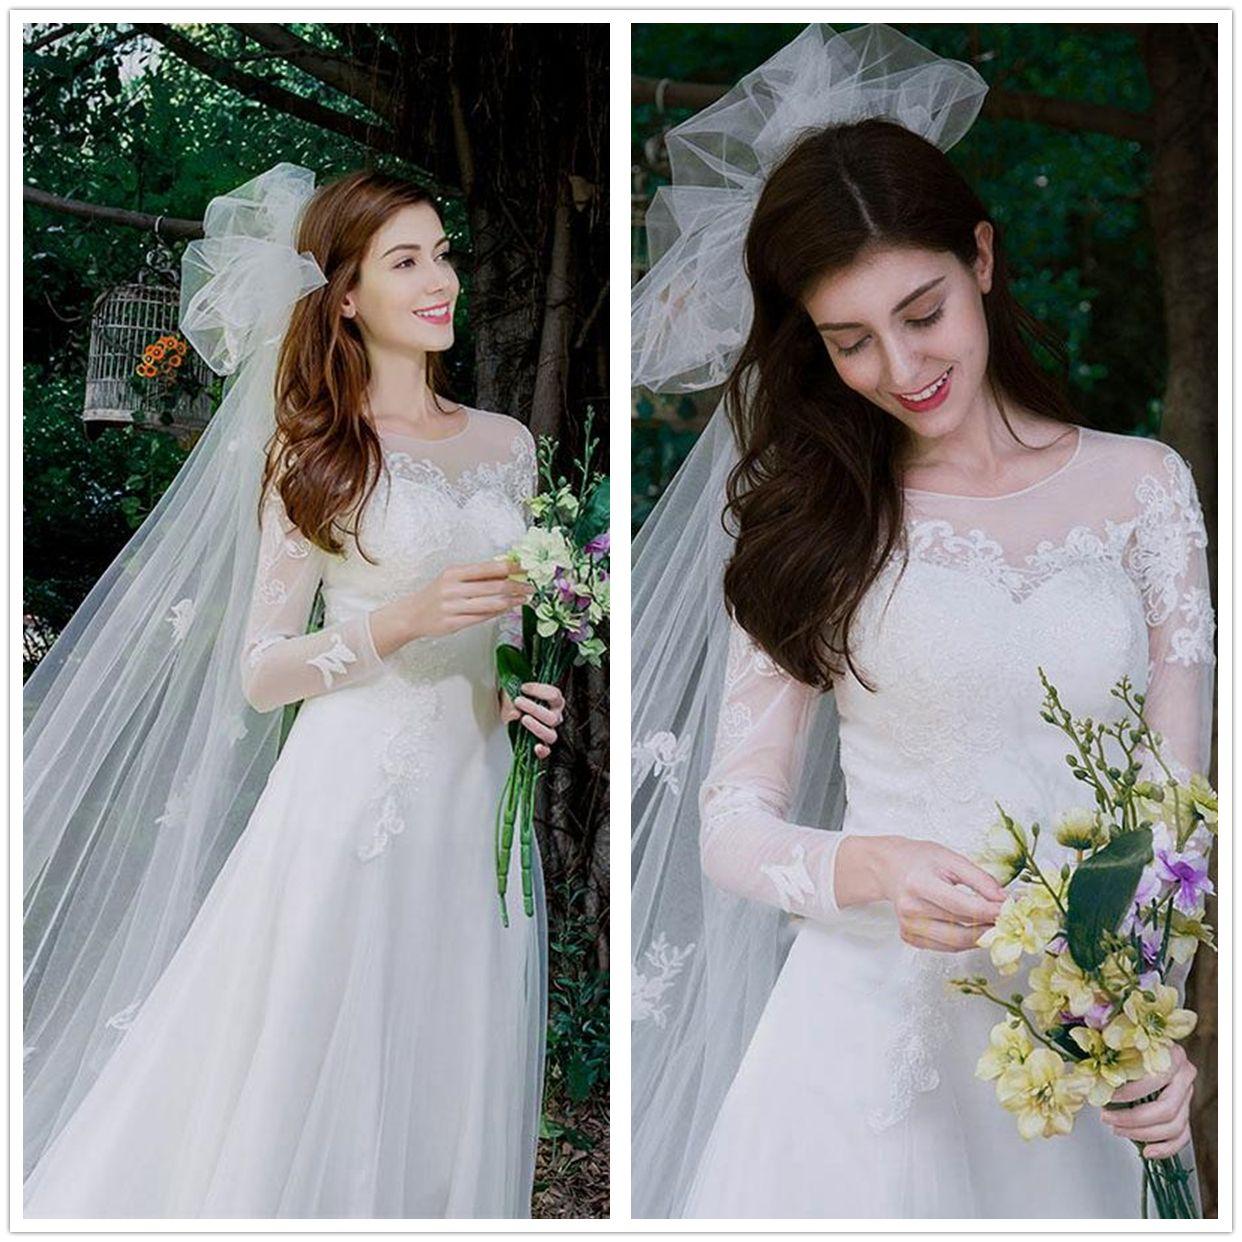 Discount Stunning White Tulle Wedding Dresses 2019 Beach